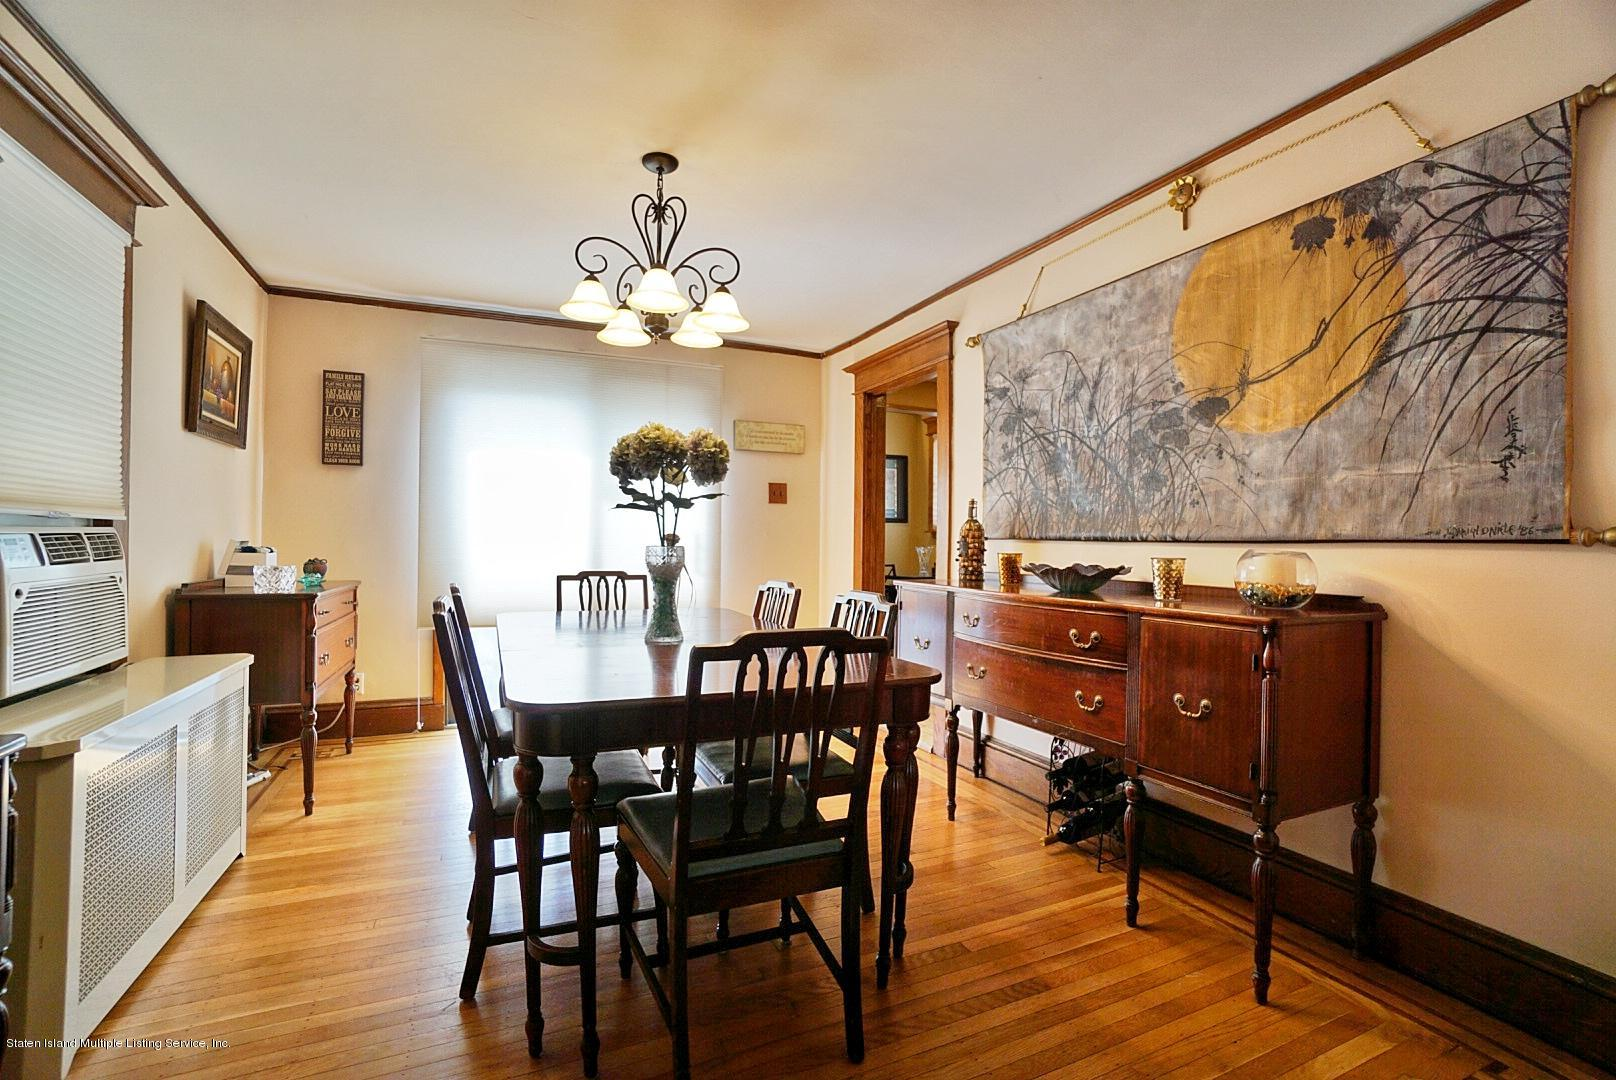 Single Family - Detached 22 Maine Avenue  Staten Island, NY 10314, MLS-1128323-23